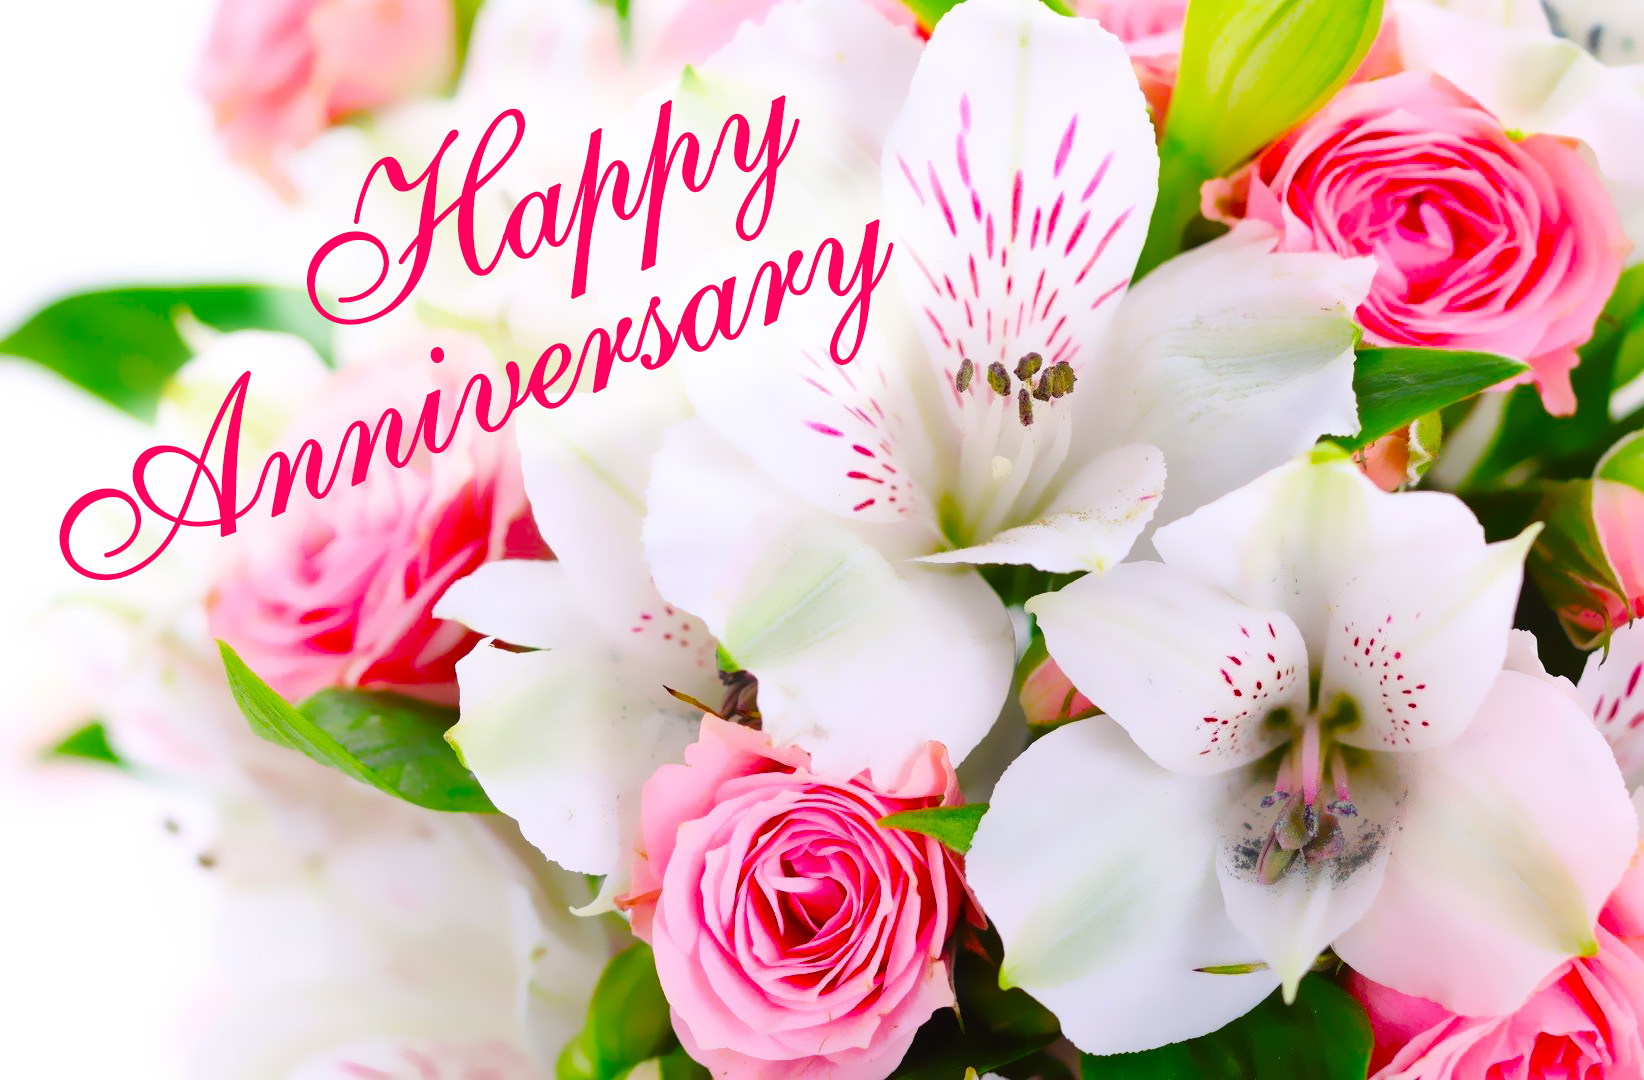 Tremendous Happy Anniversary Wishes Happy Anniversary Wishes Happy Anniversary Images Husband Happy Anniversary Images Gif photos Happy Anniversary Images